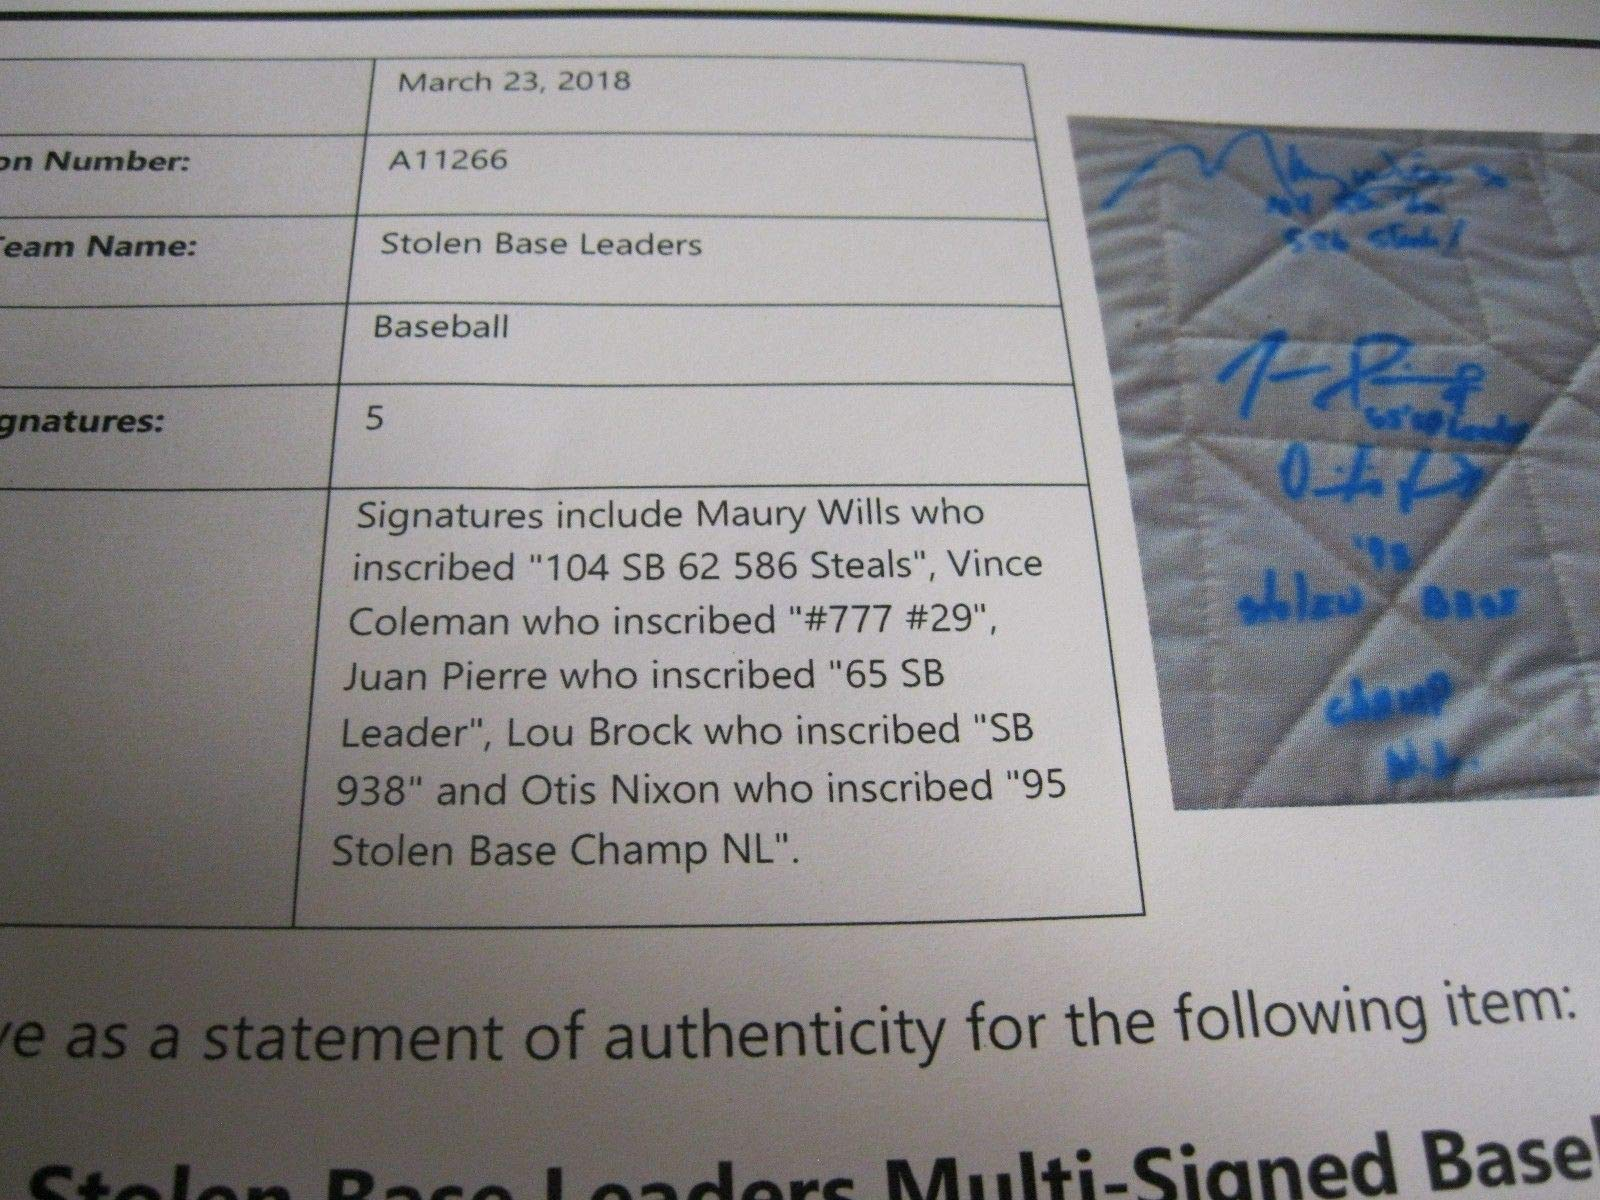 Lou Brock Autographed Top Stolen Base Leaders Autographed Signed Base Beckett Certified